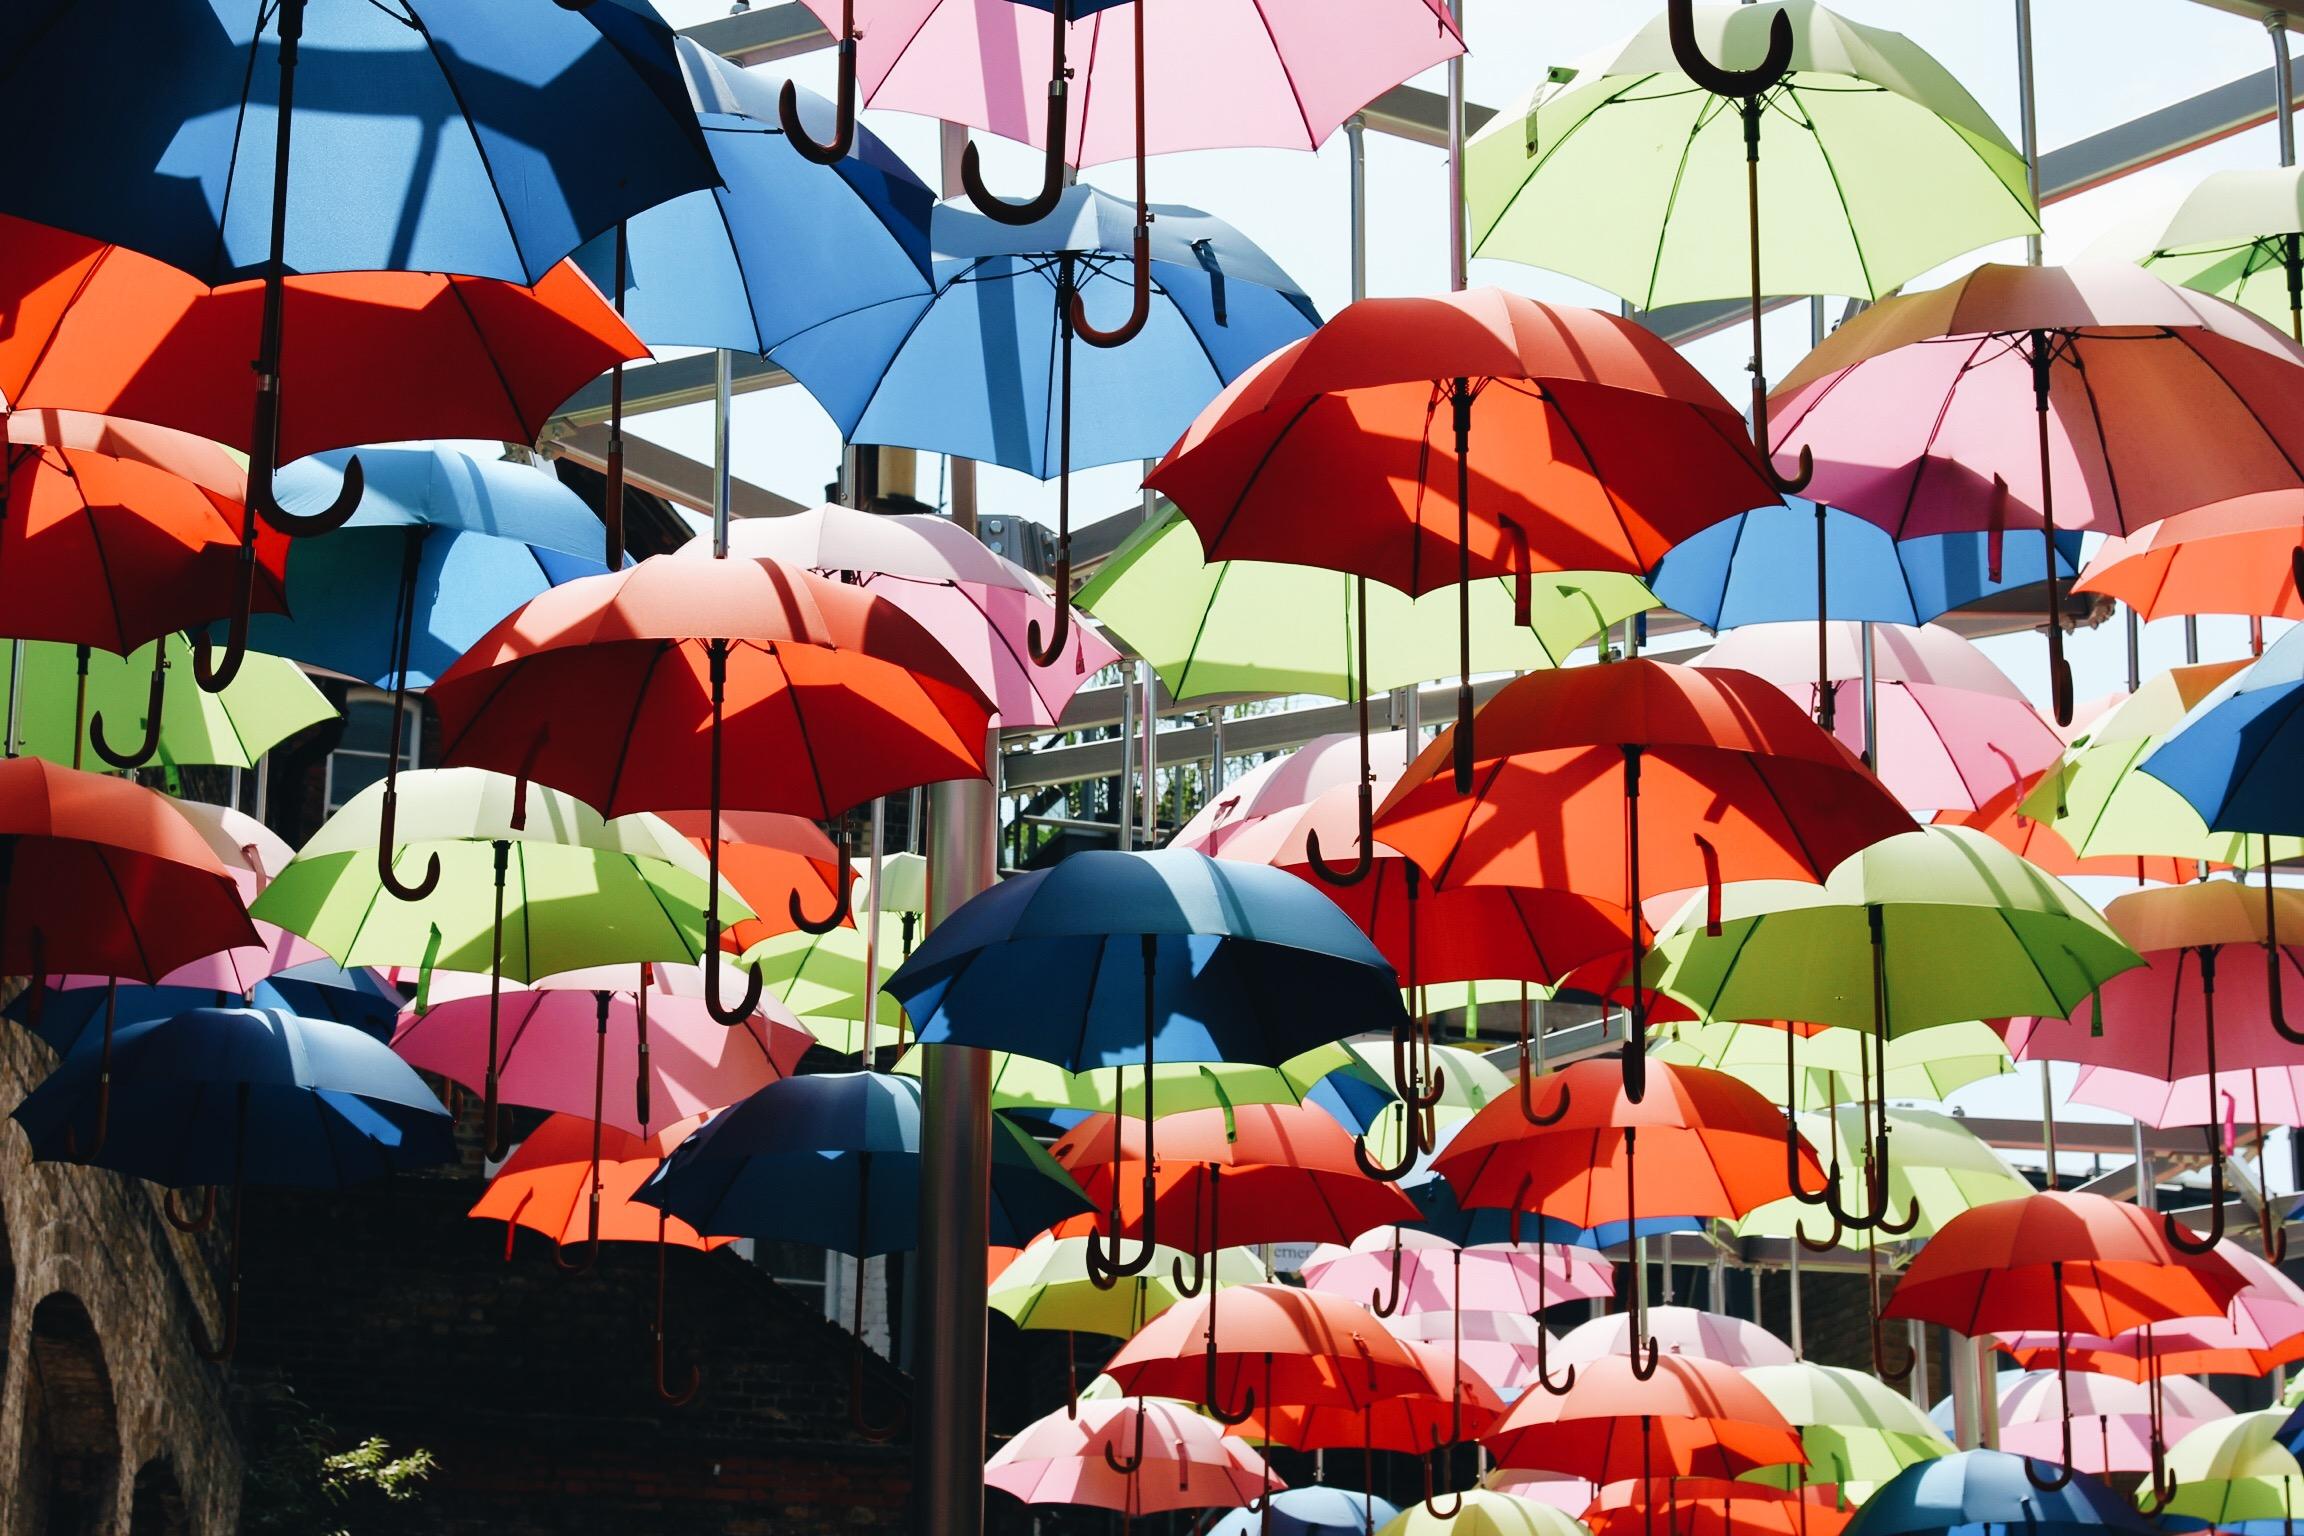 borough-market-umbrellas-vinopolis-piazza.jpg